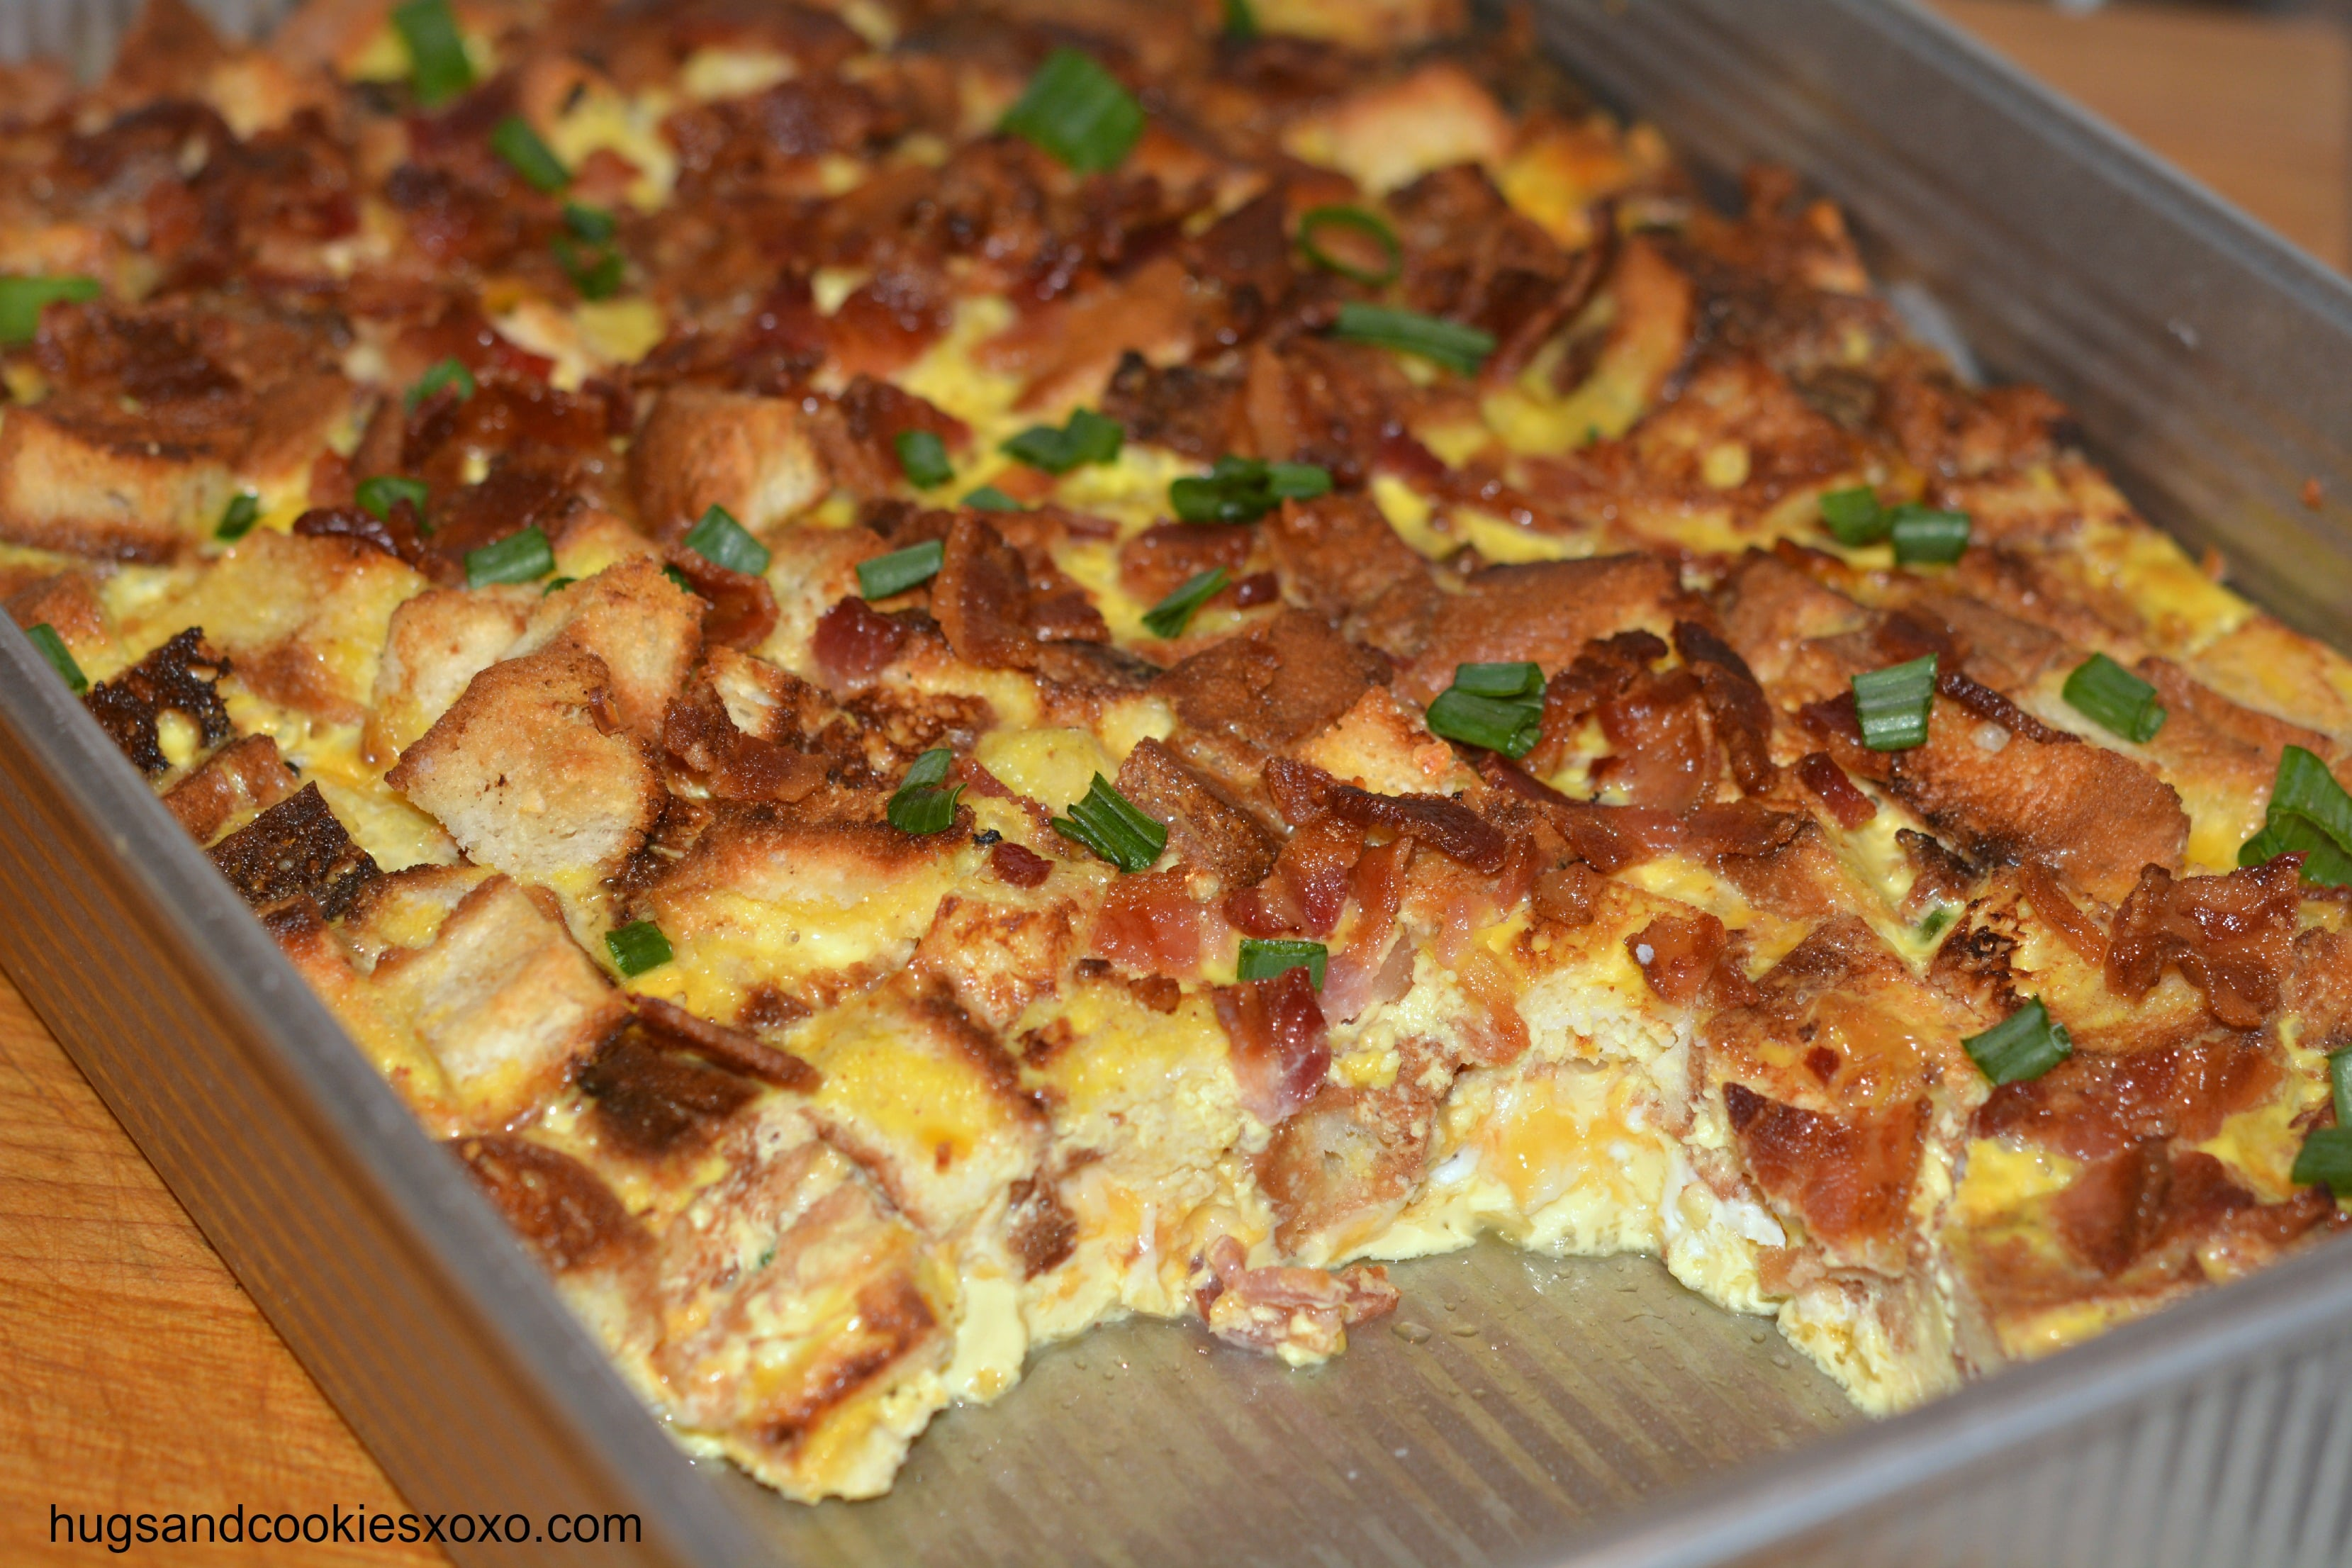 Overnight Bacon, Egg & Cheese Casserole - Hugs and Cookies XOXO